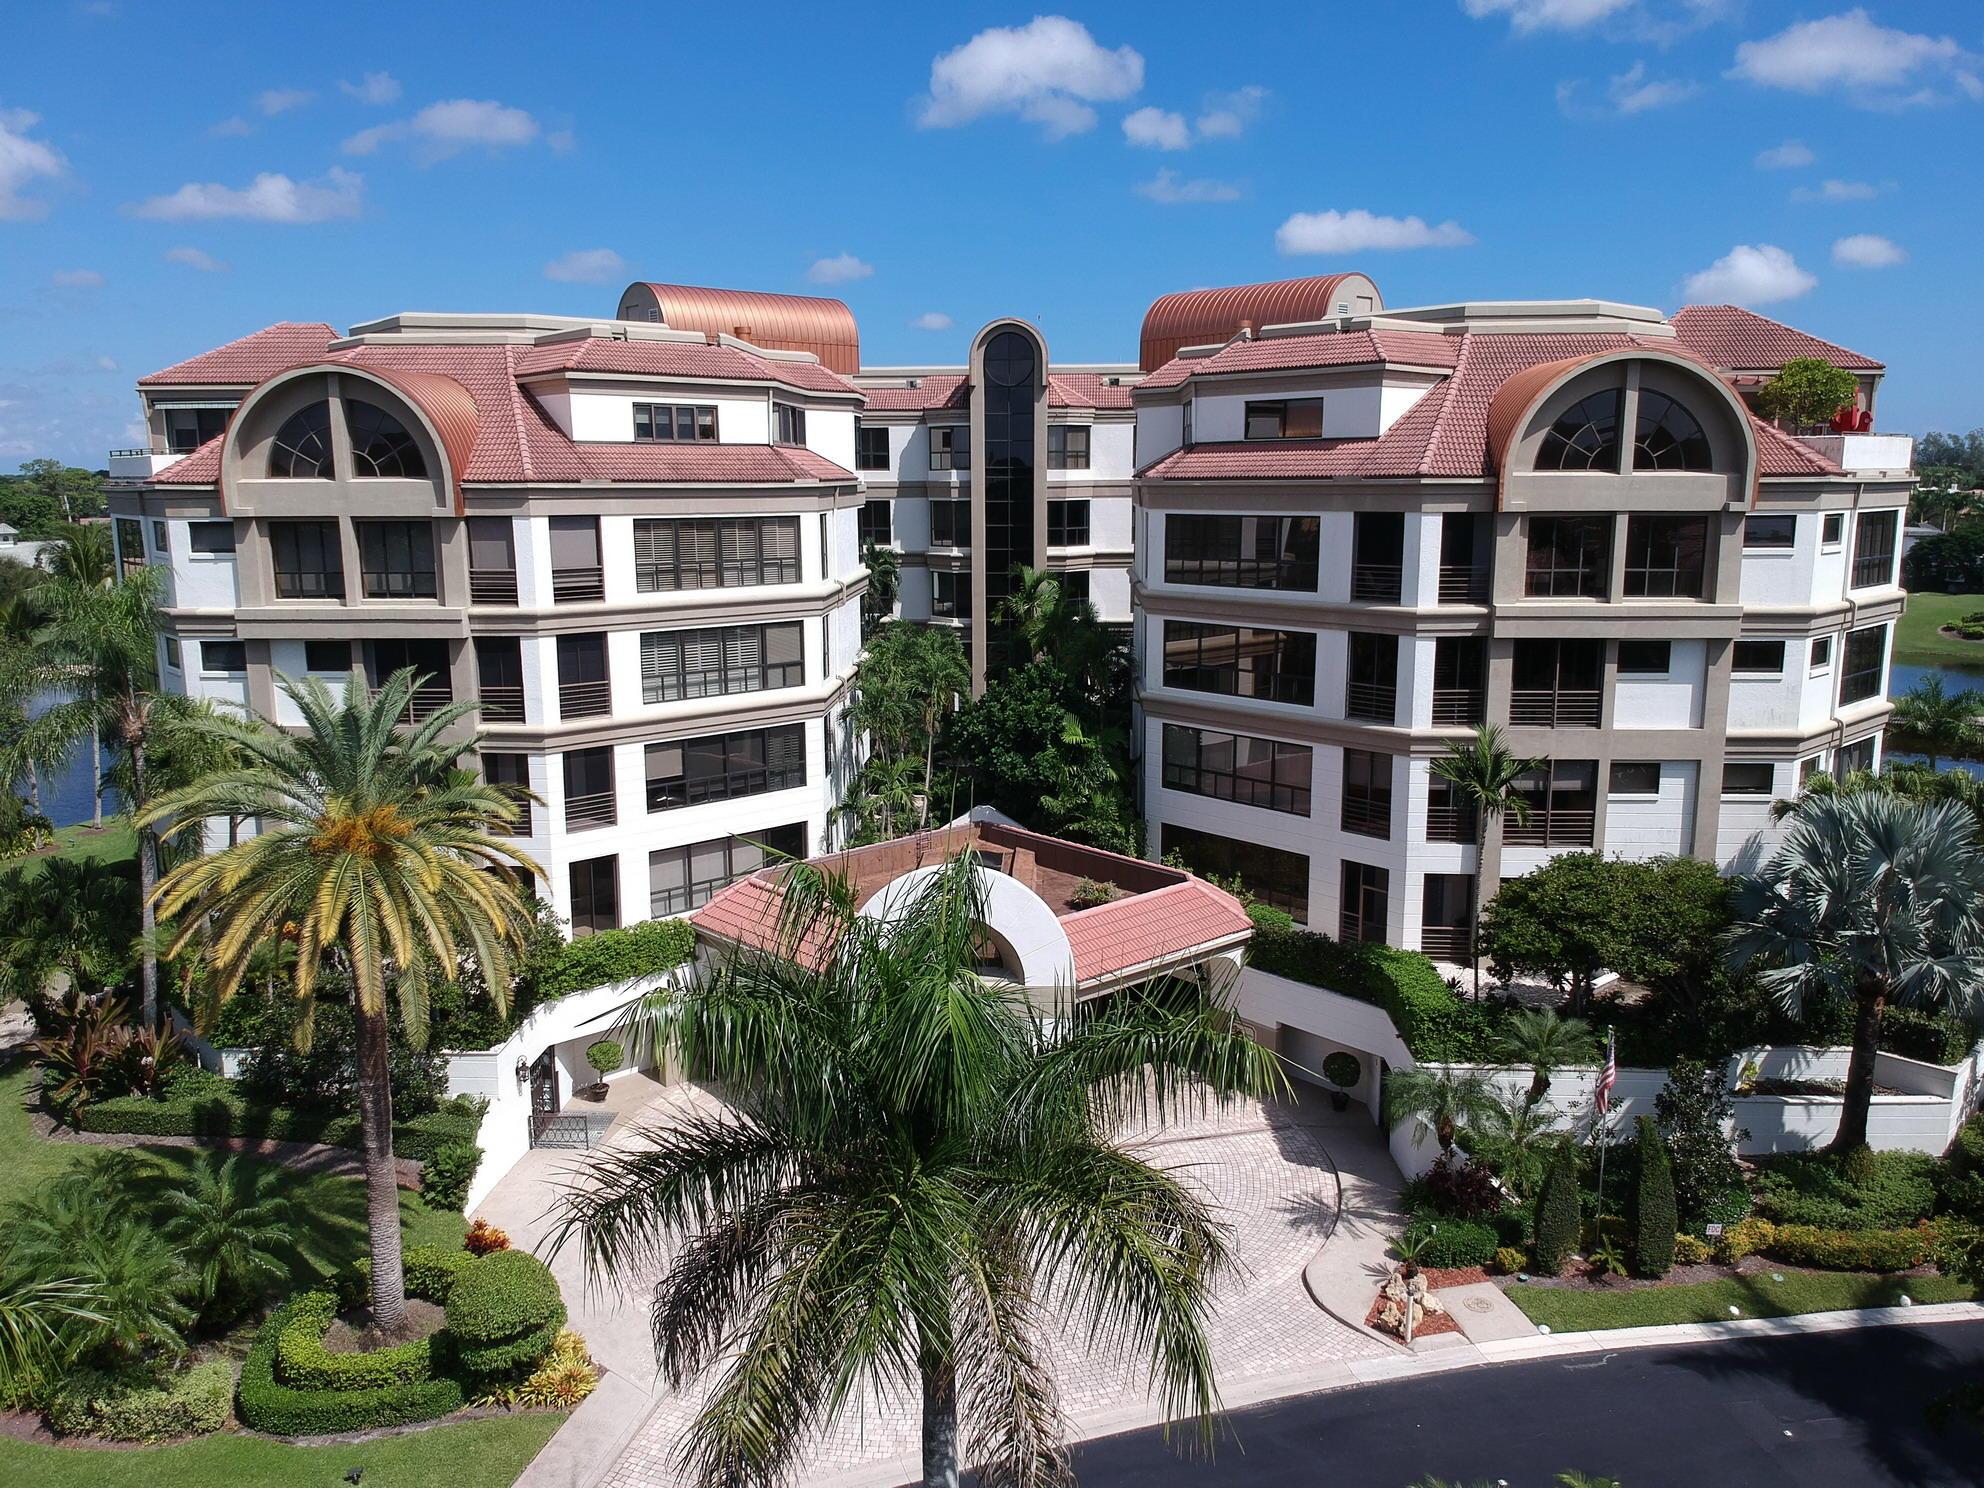 7383 Orangewood Lane #504 Boca Raton, FL 33433